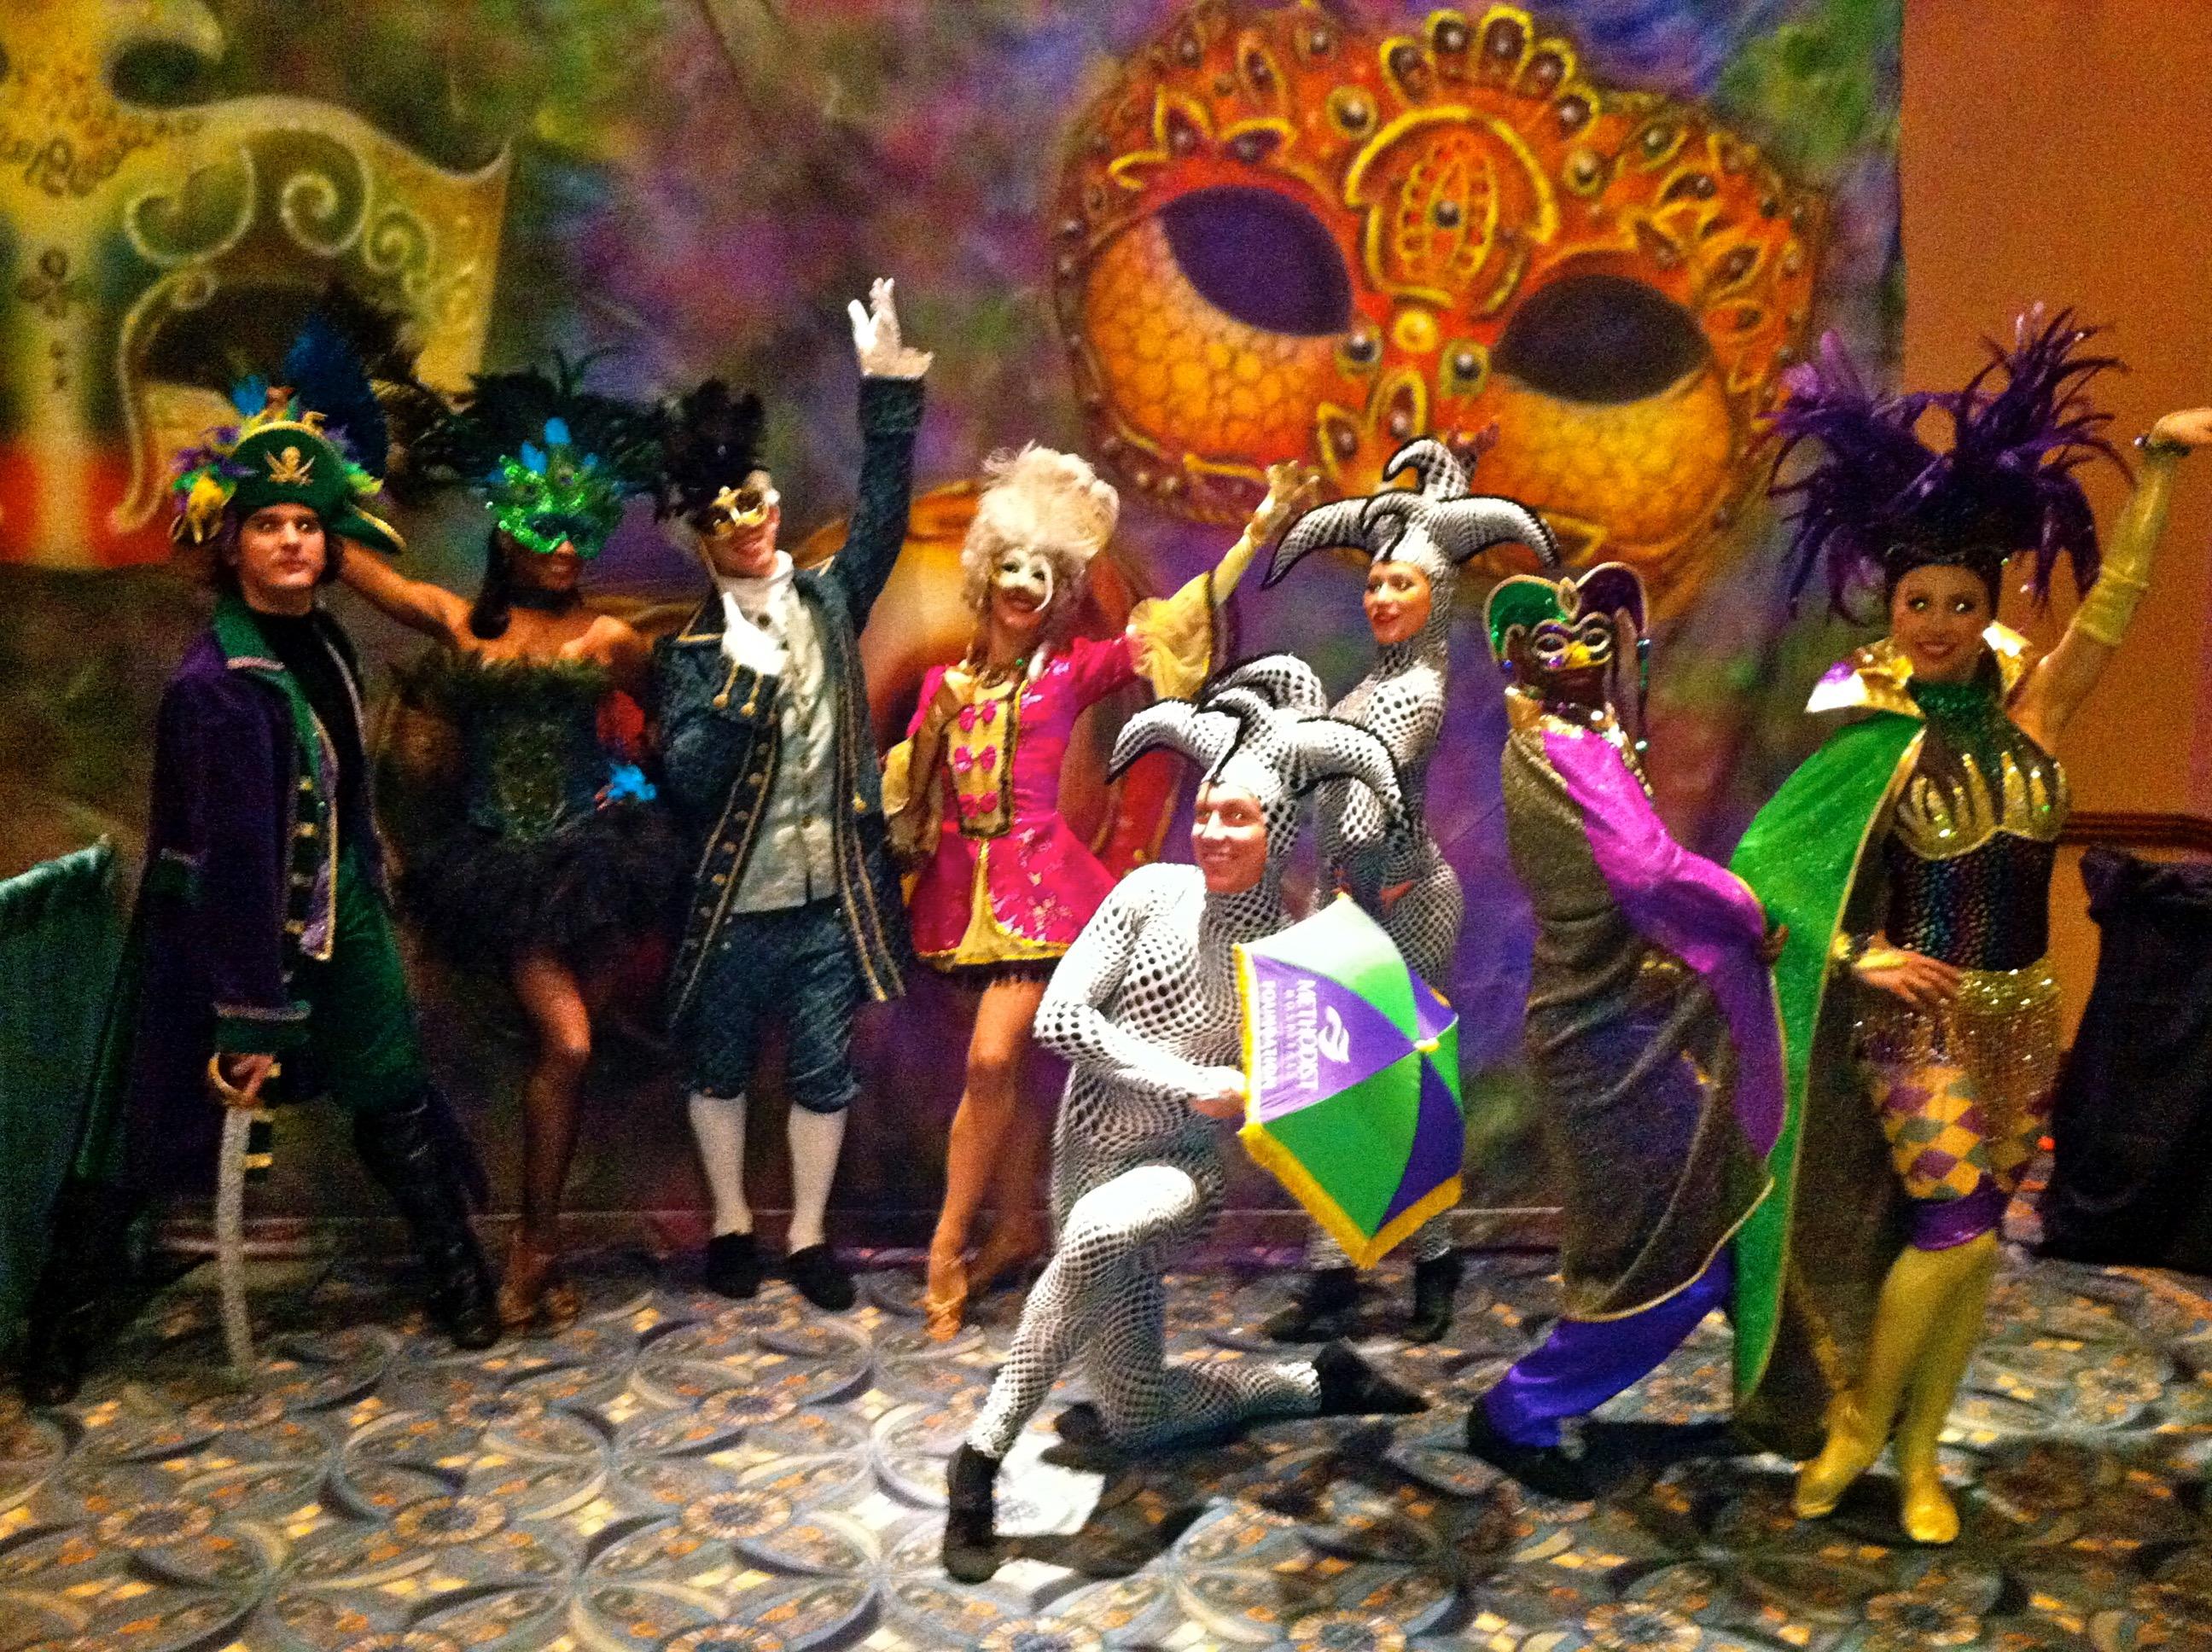 Mardi Gras Performers